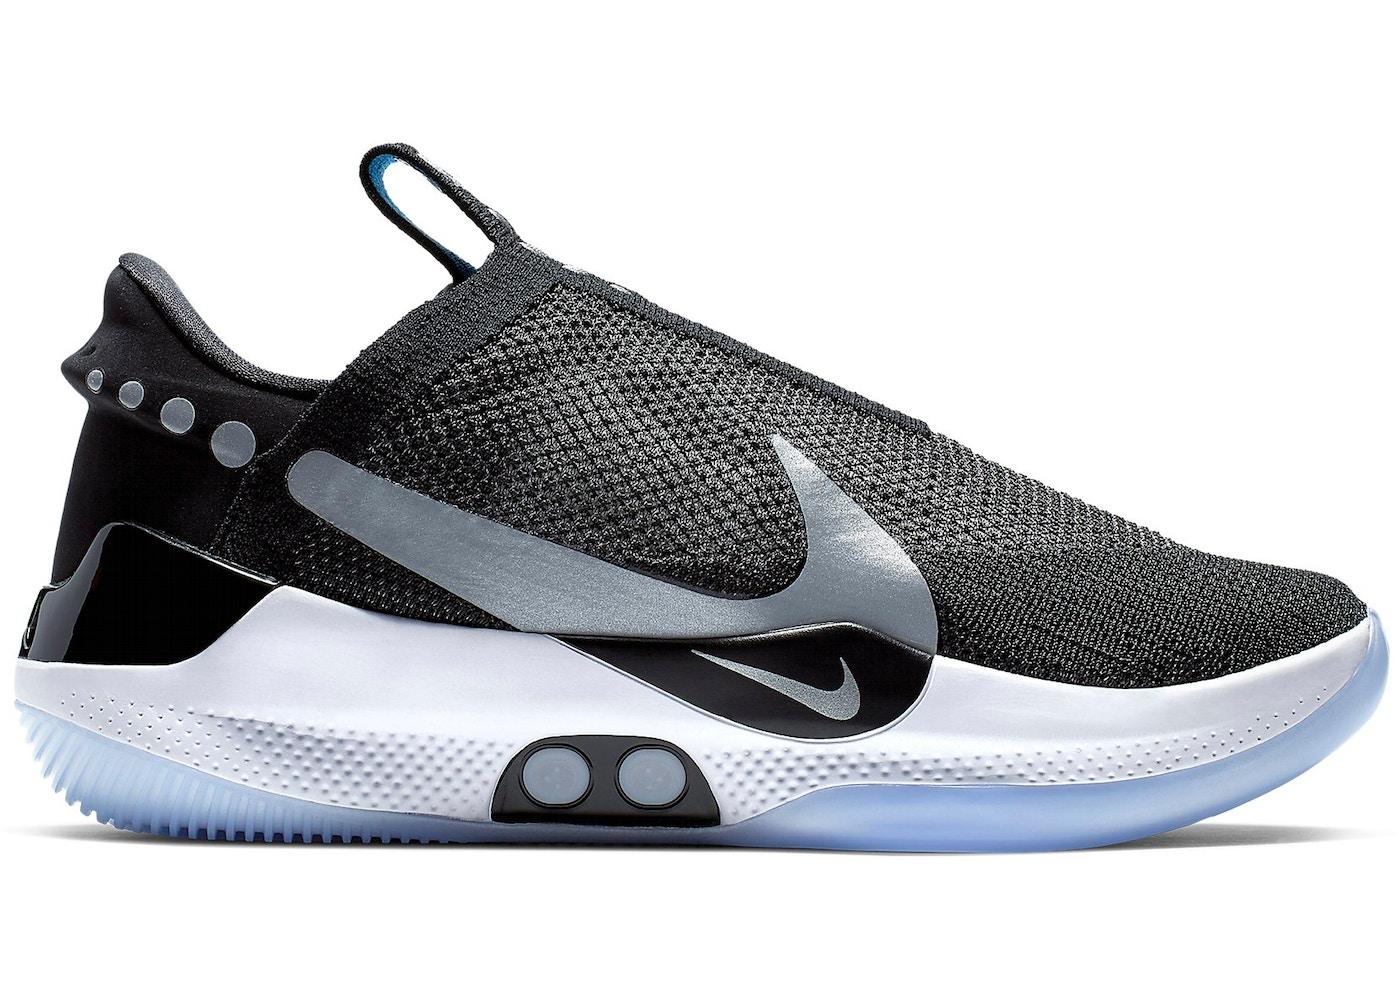 a10bdcea6b2 Nike Adapt BB Black Pure Platinum (UK Charger) - CJ4999-001